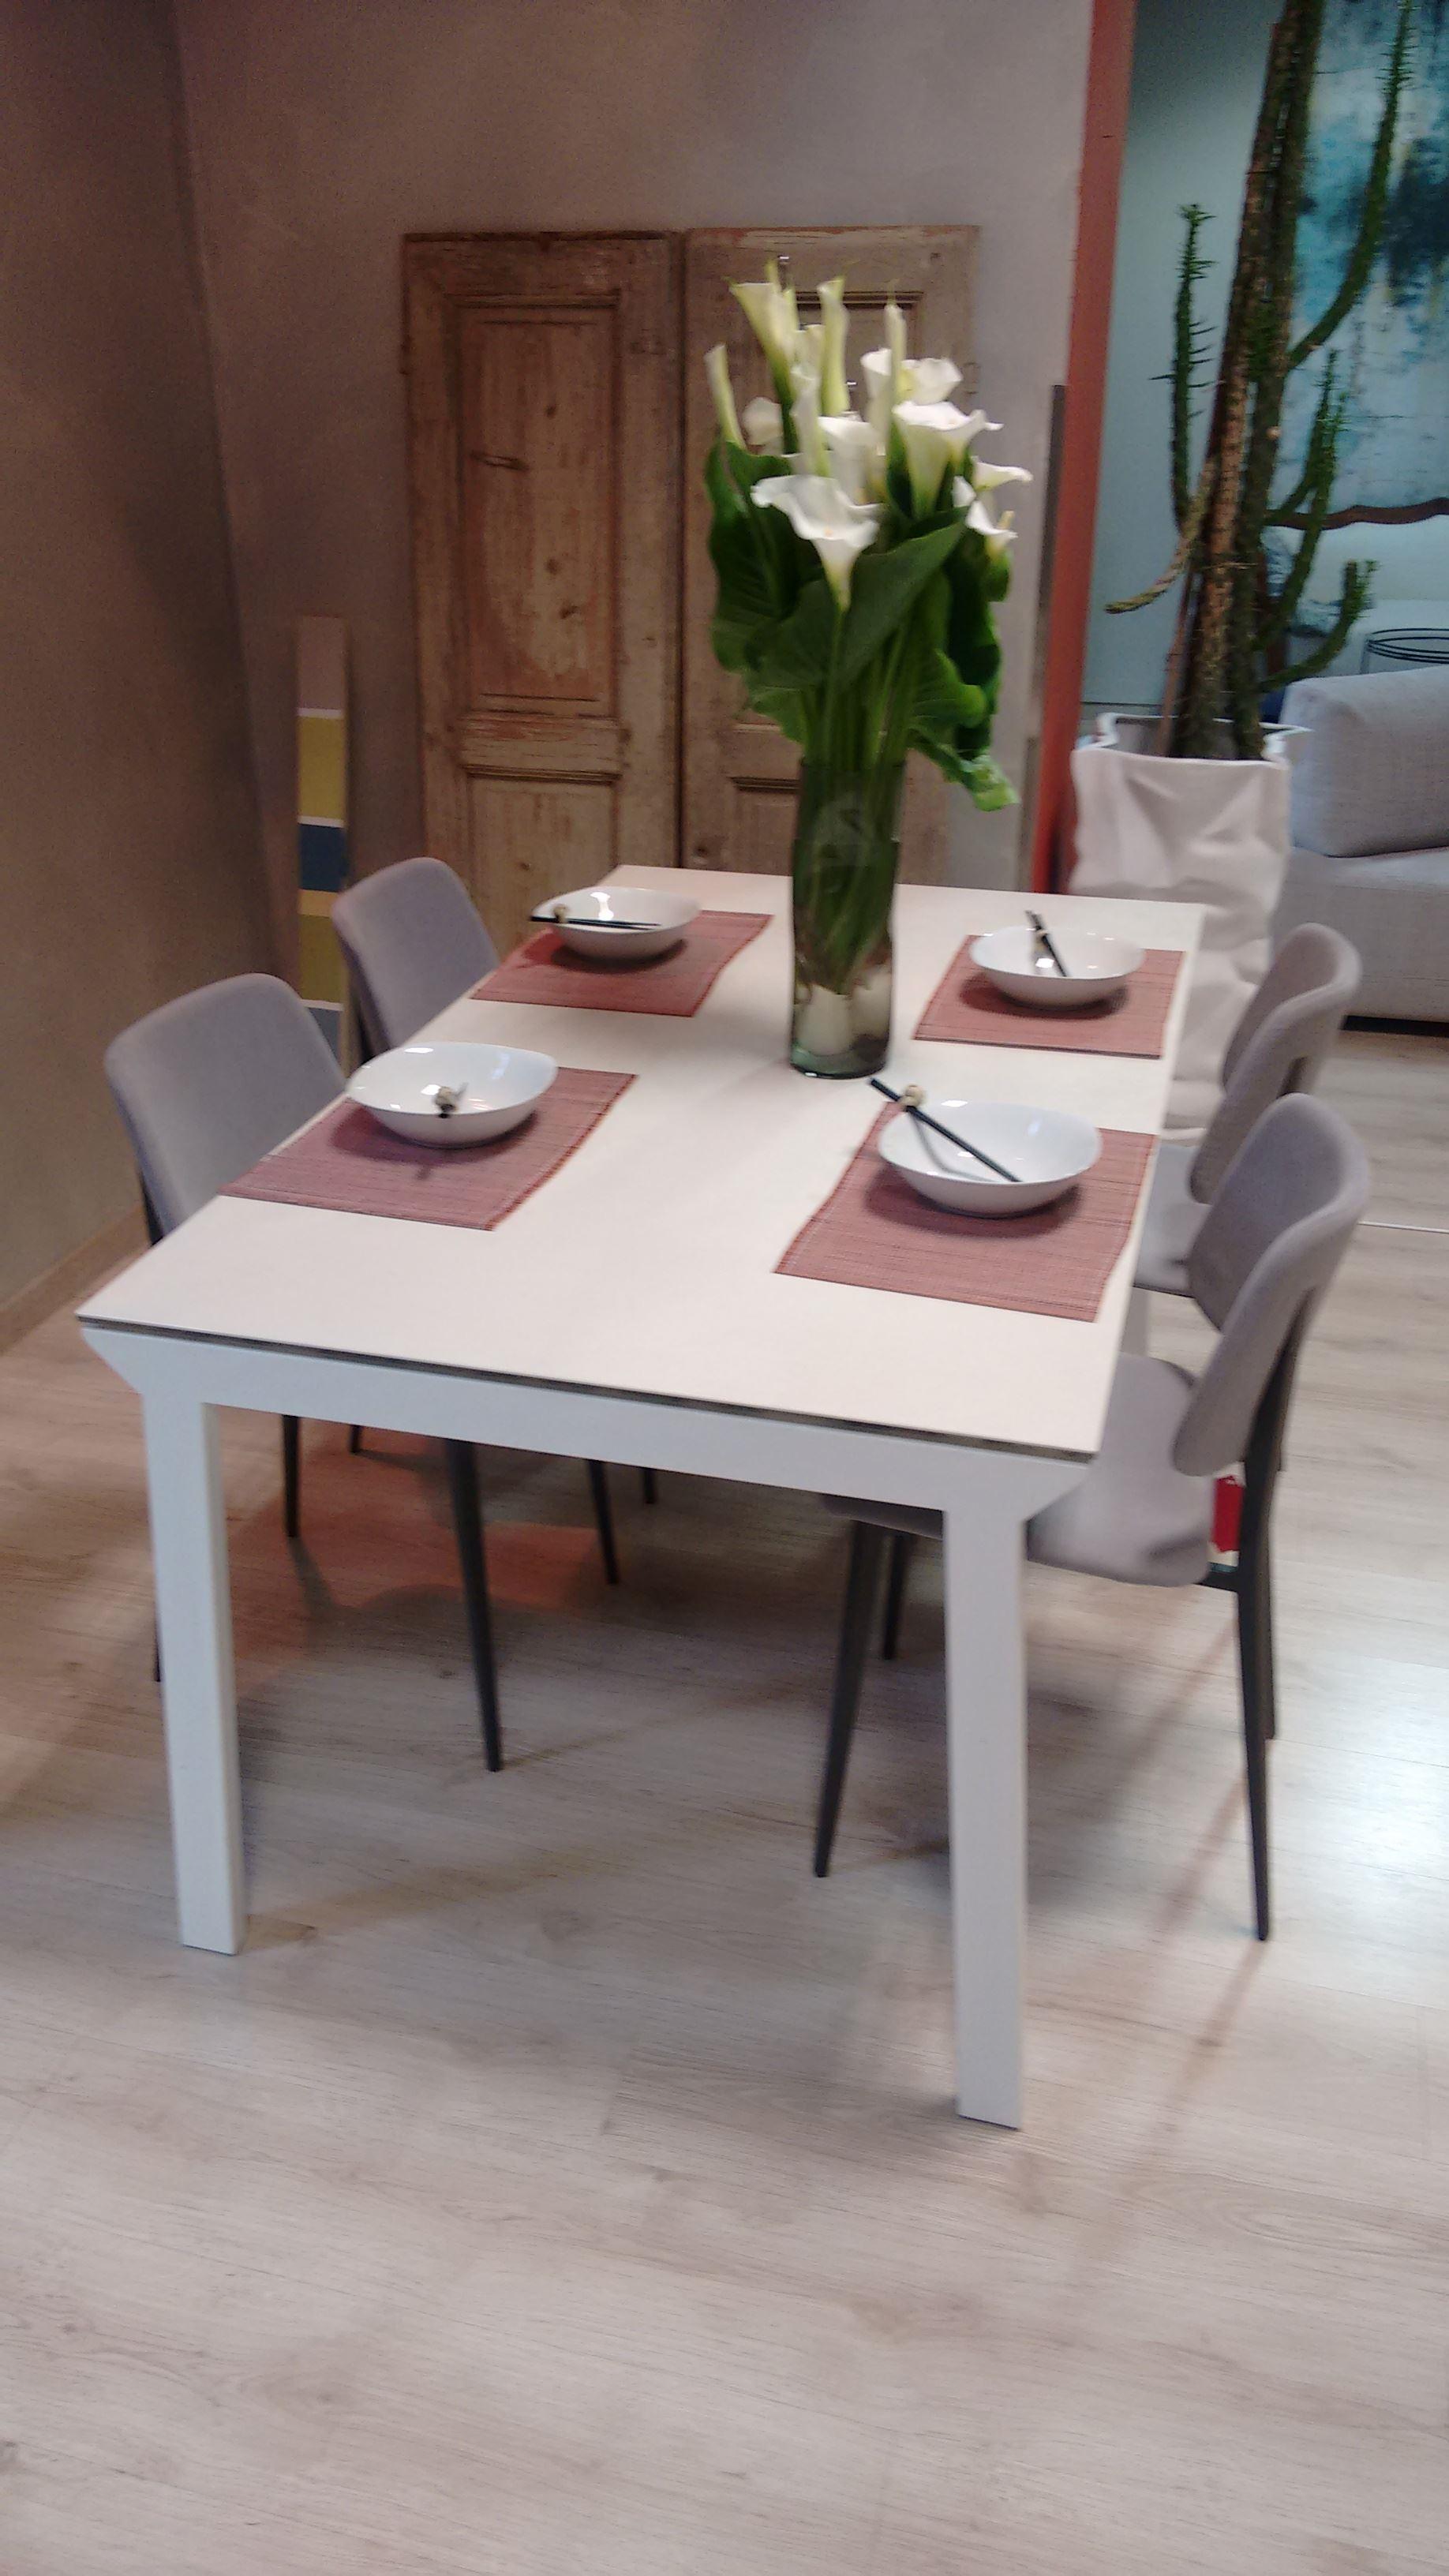 Offerta tavolo midj tavolo midj mod greco e sedie mod - Tavoli e sedie in offerta ...